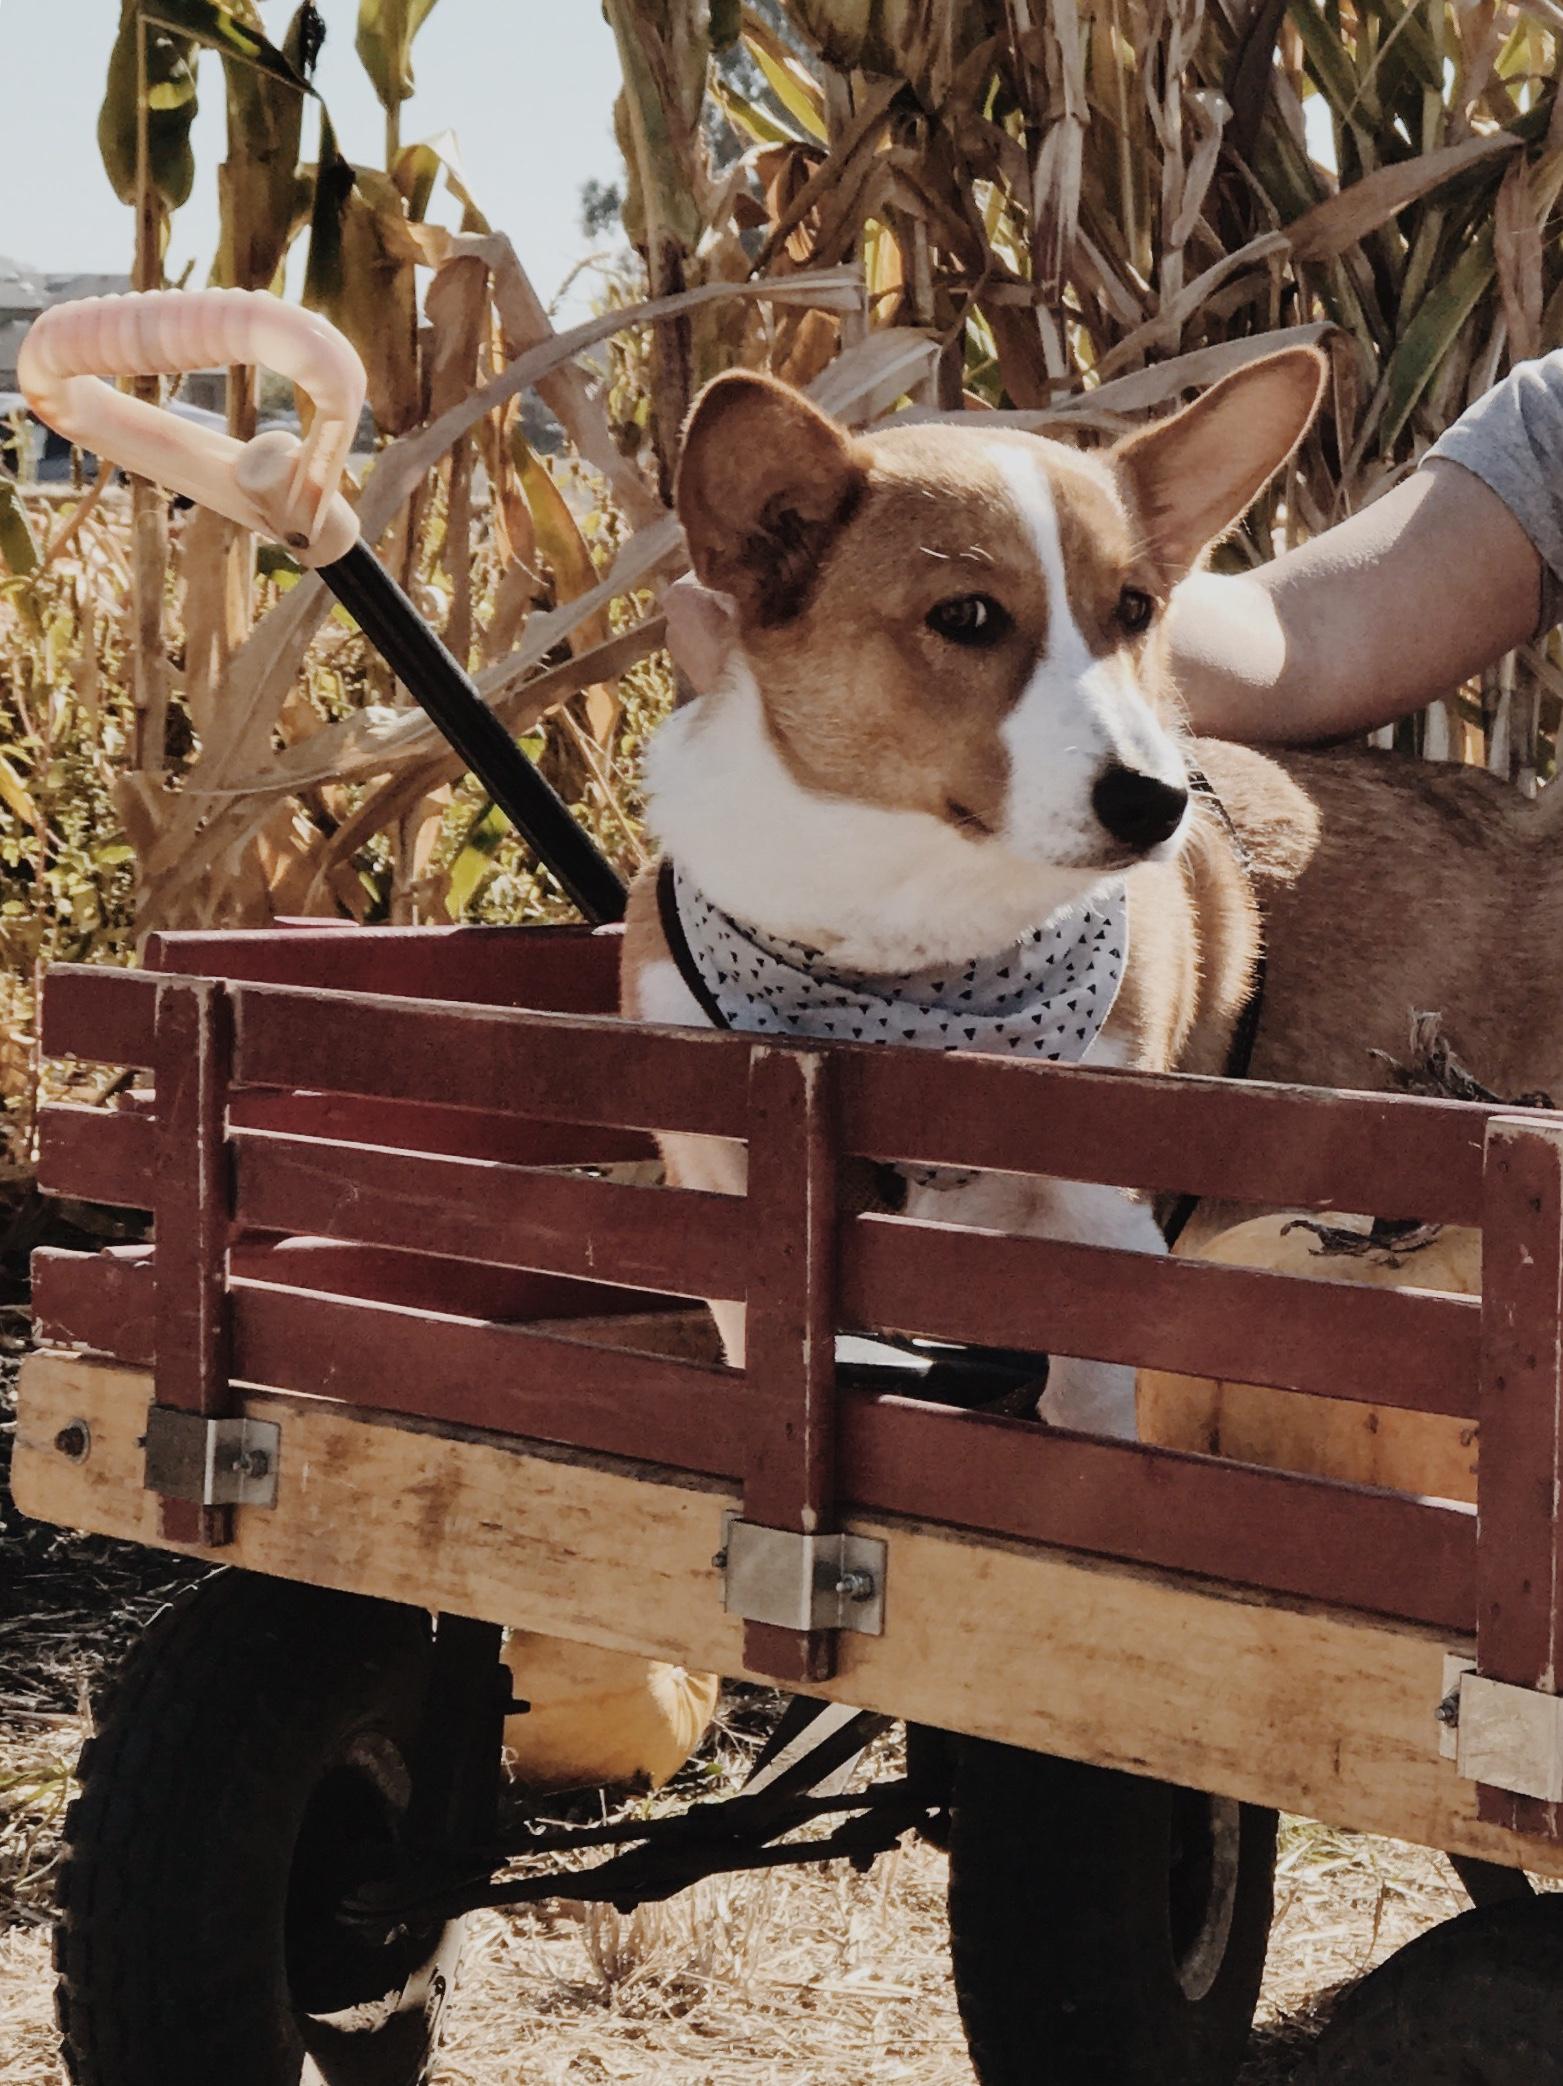 Pumpkin Patch Bay Area Farmer John's Dog Friendly Corgi Ollieforshort